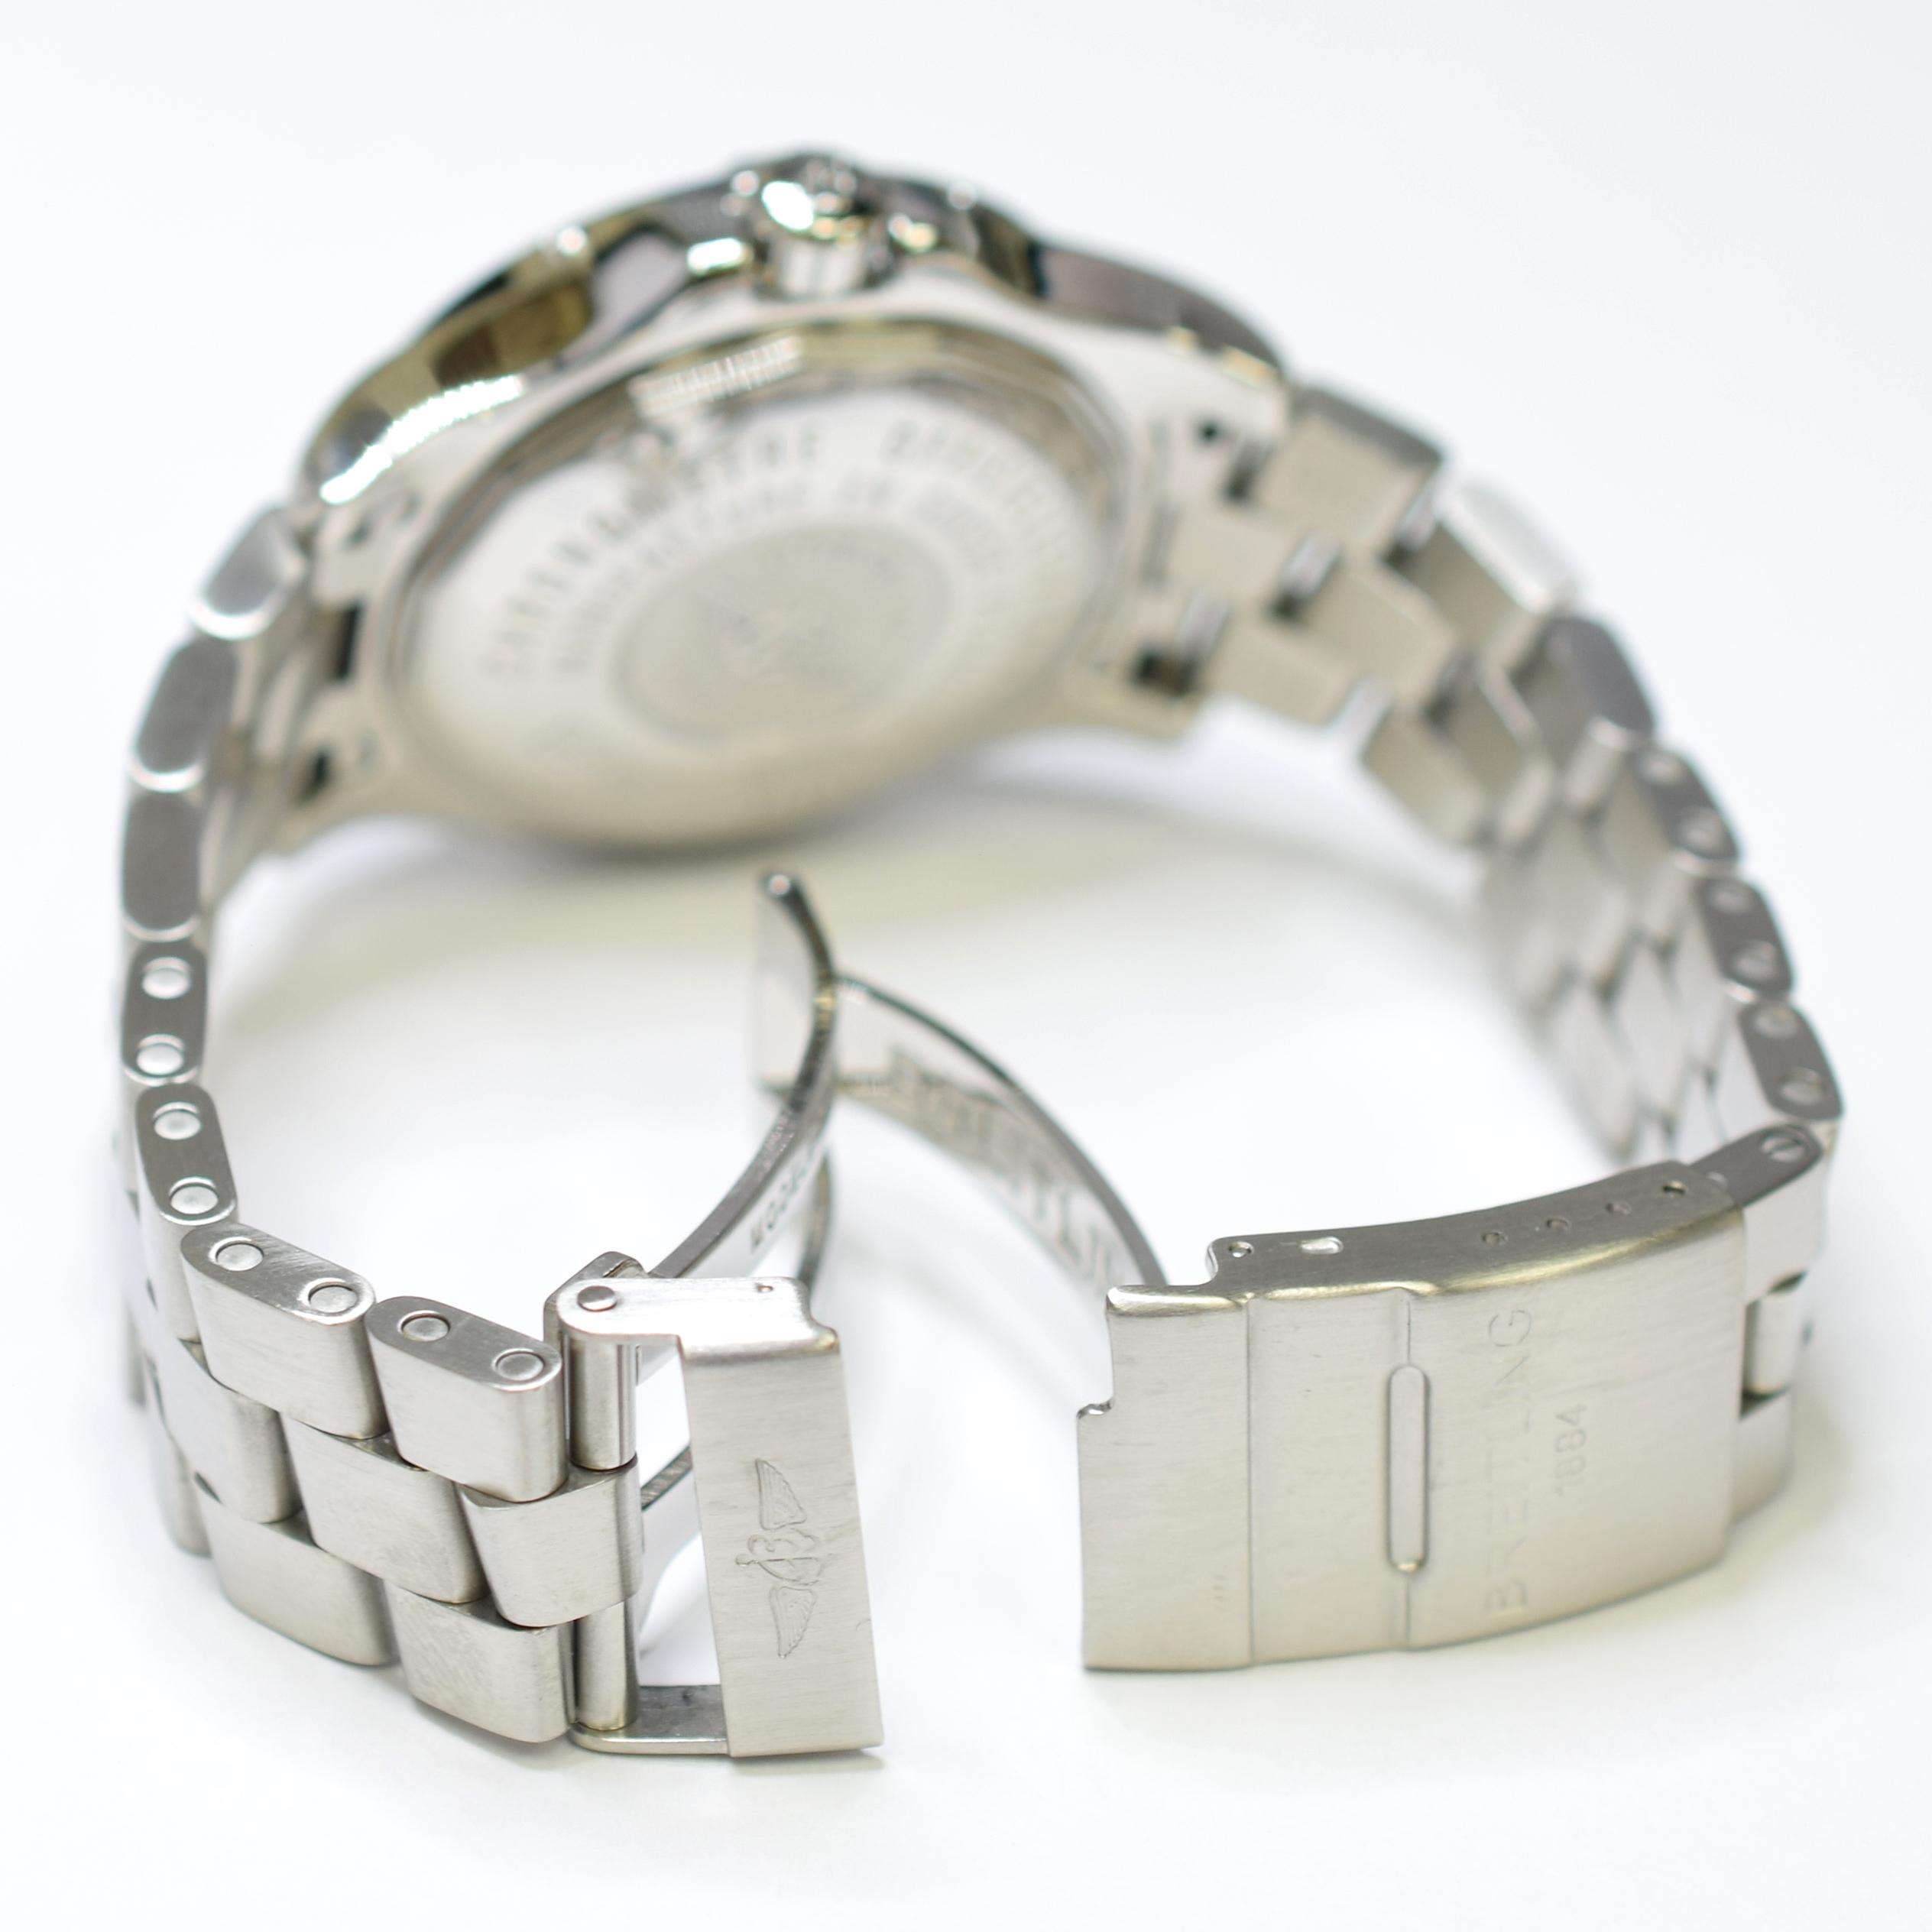 Breitling Colt Chronometer 41mm Stainless Steel Quartz Watch A